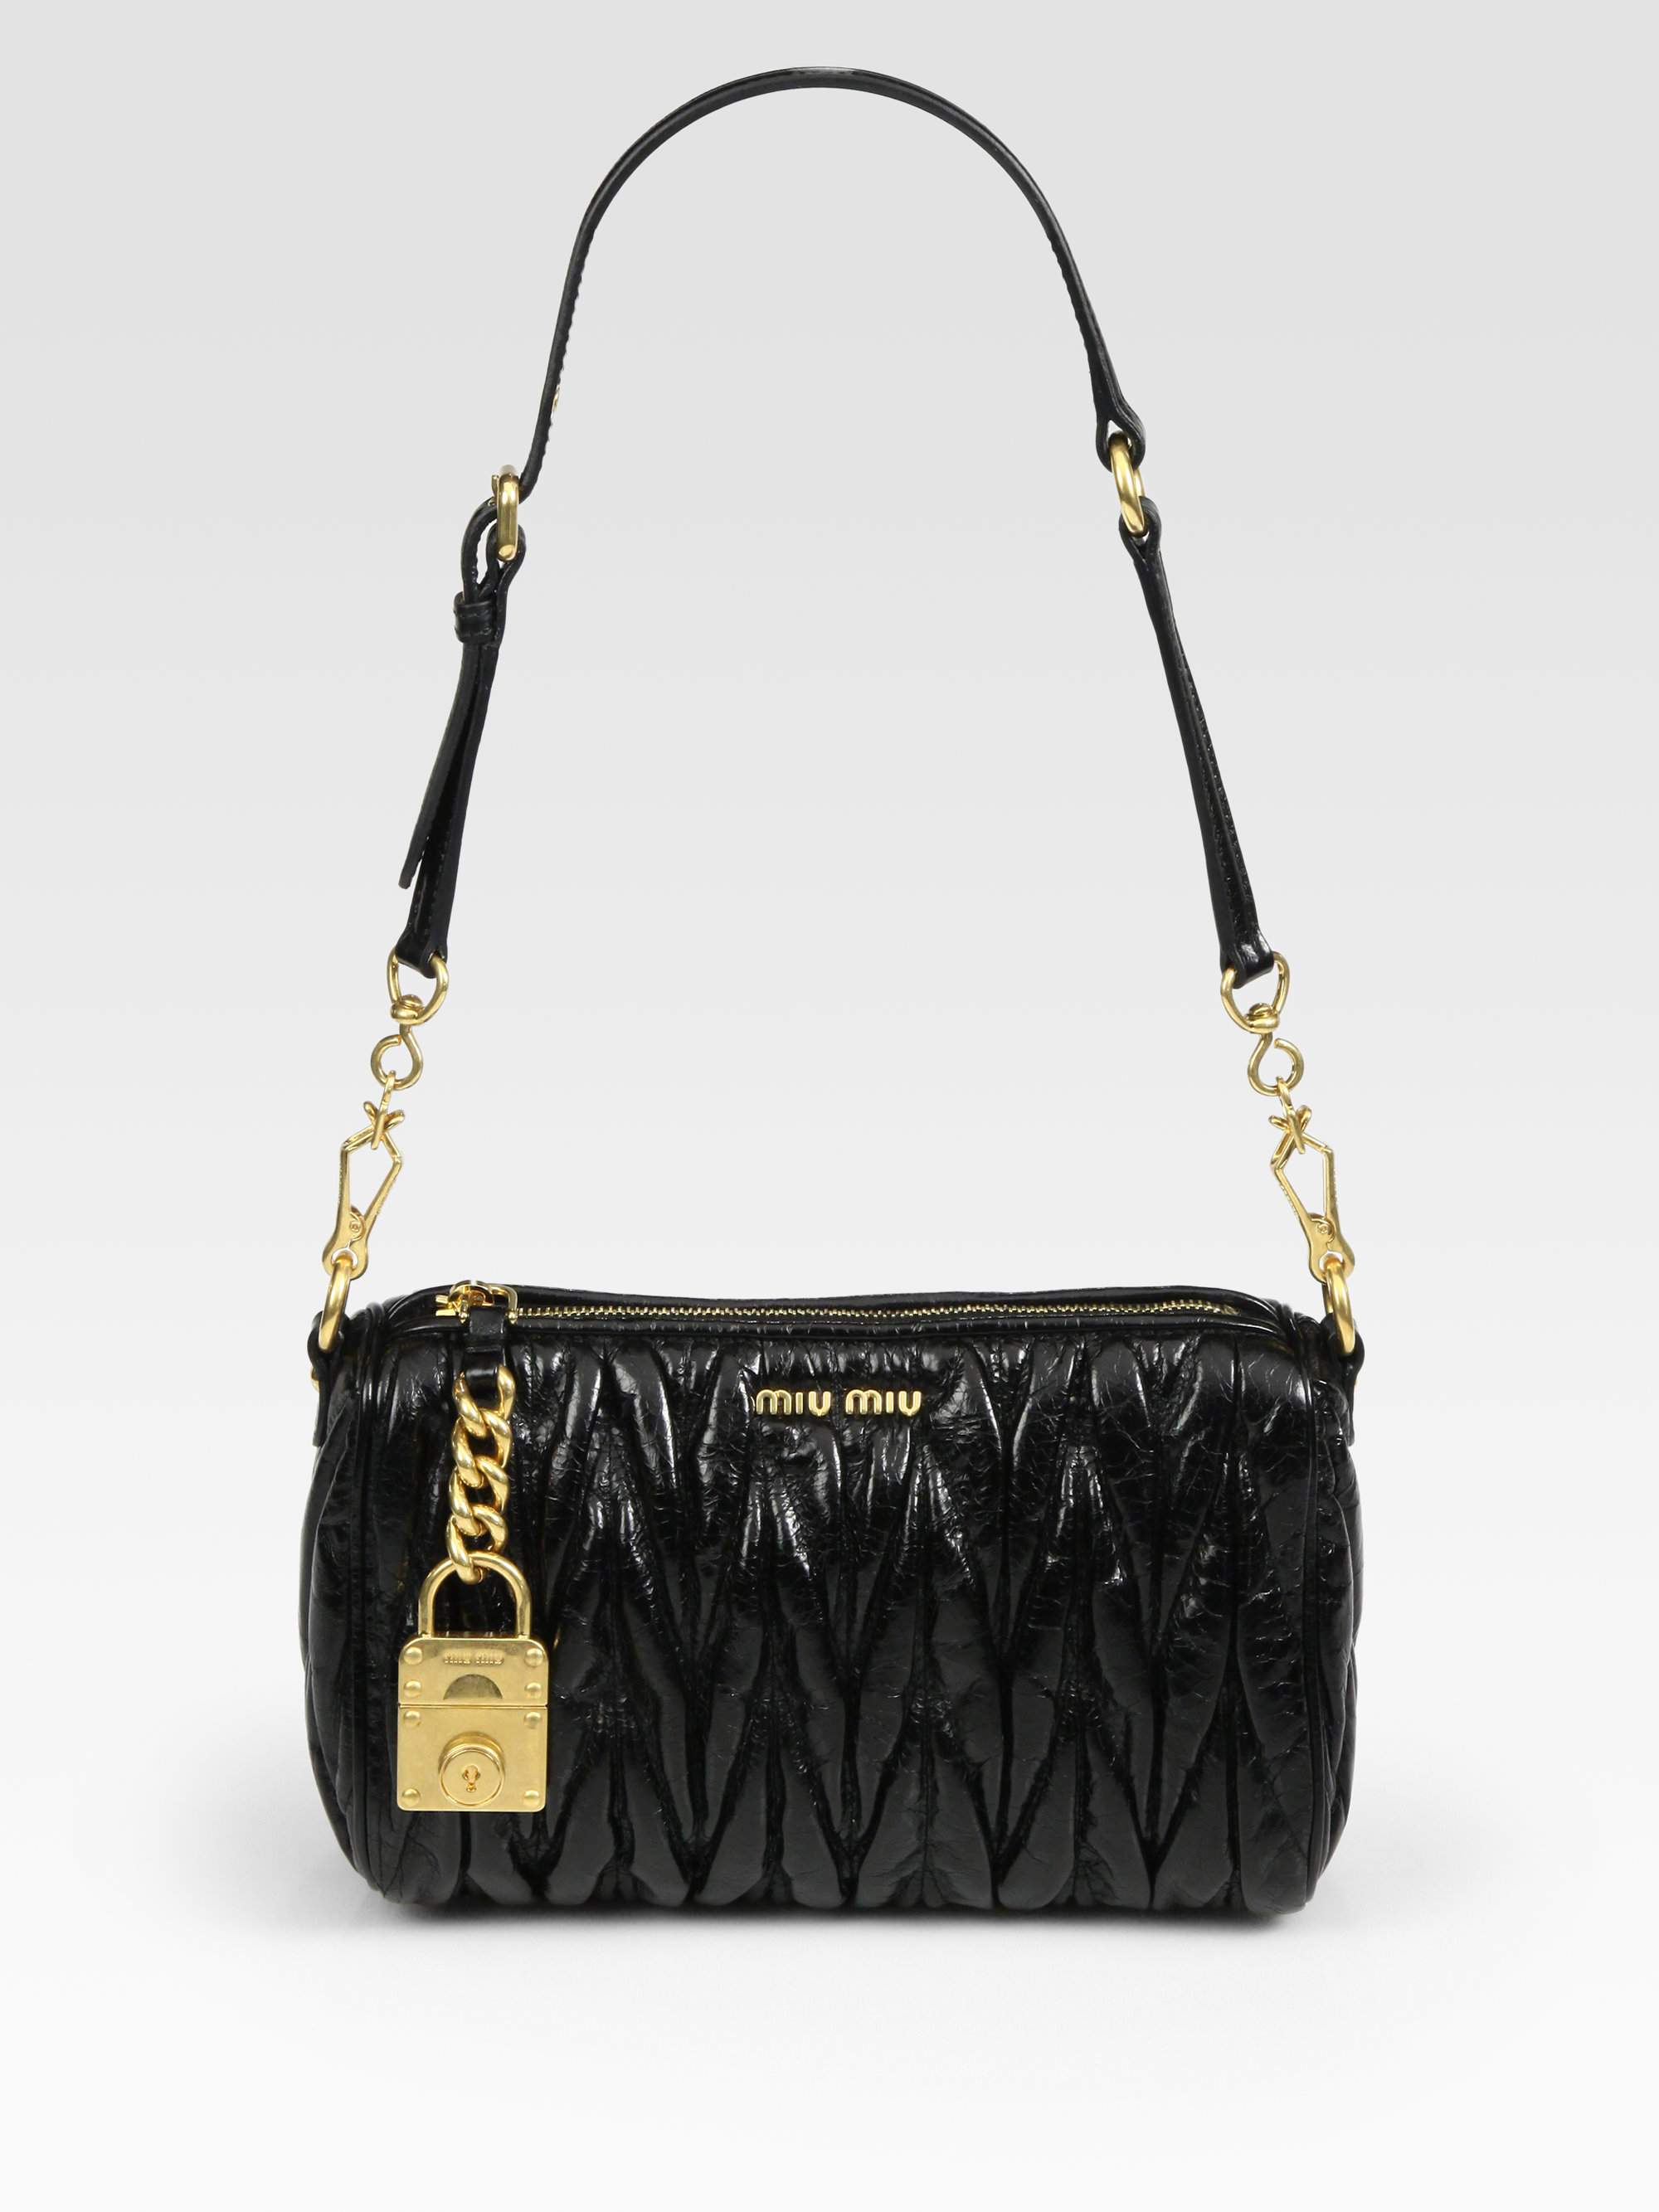 Lyst - Miu Miu Matelasse Lux Shoulder Bag in Black ac90663240